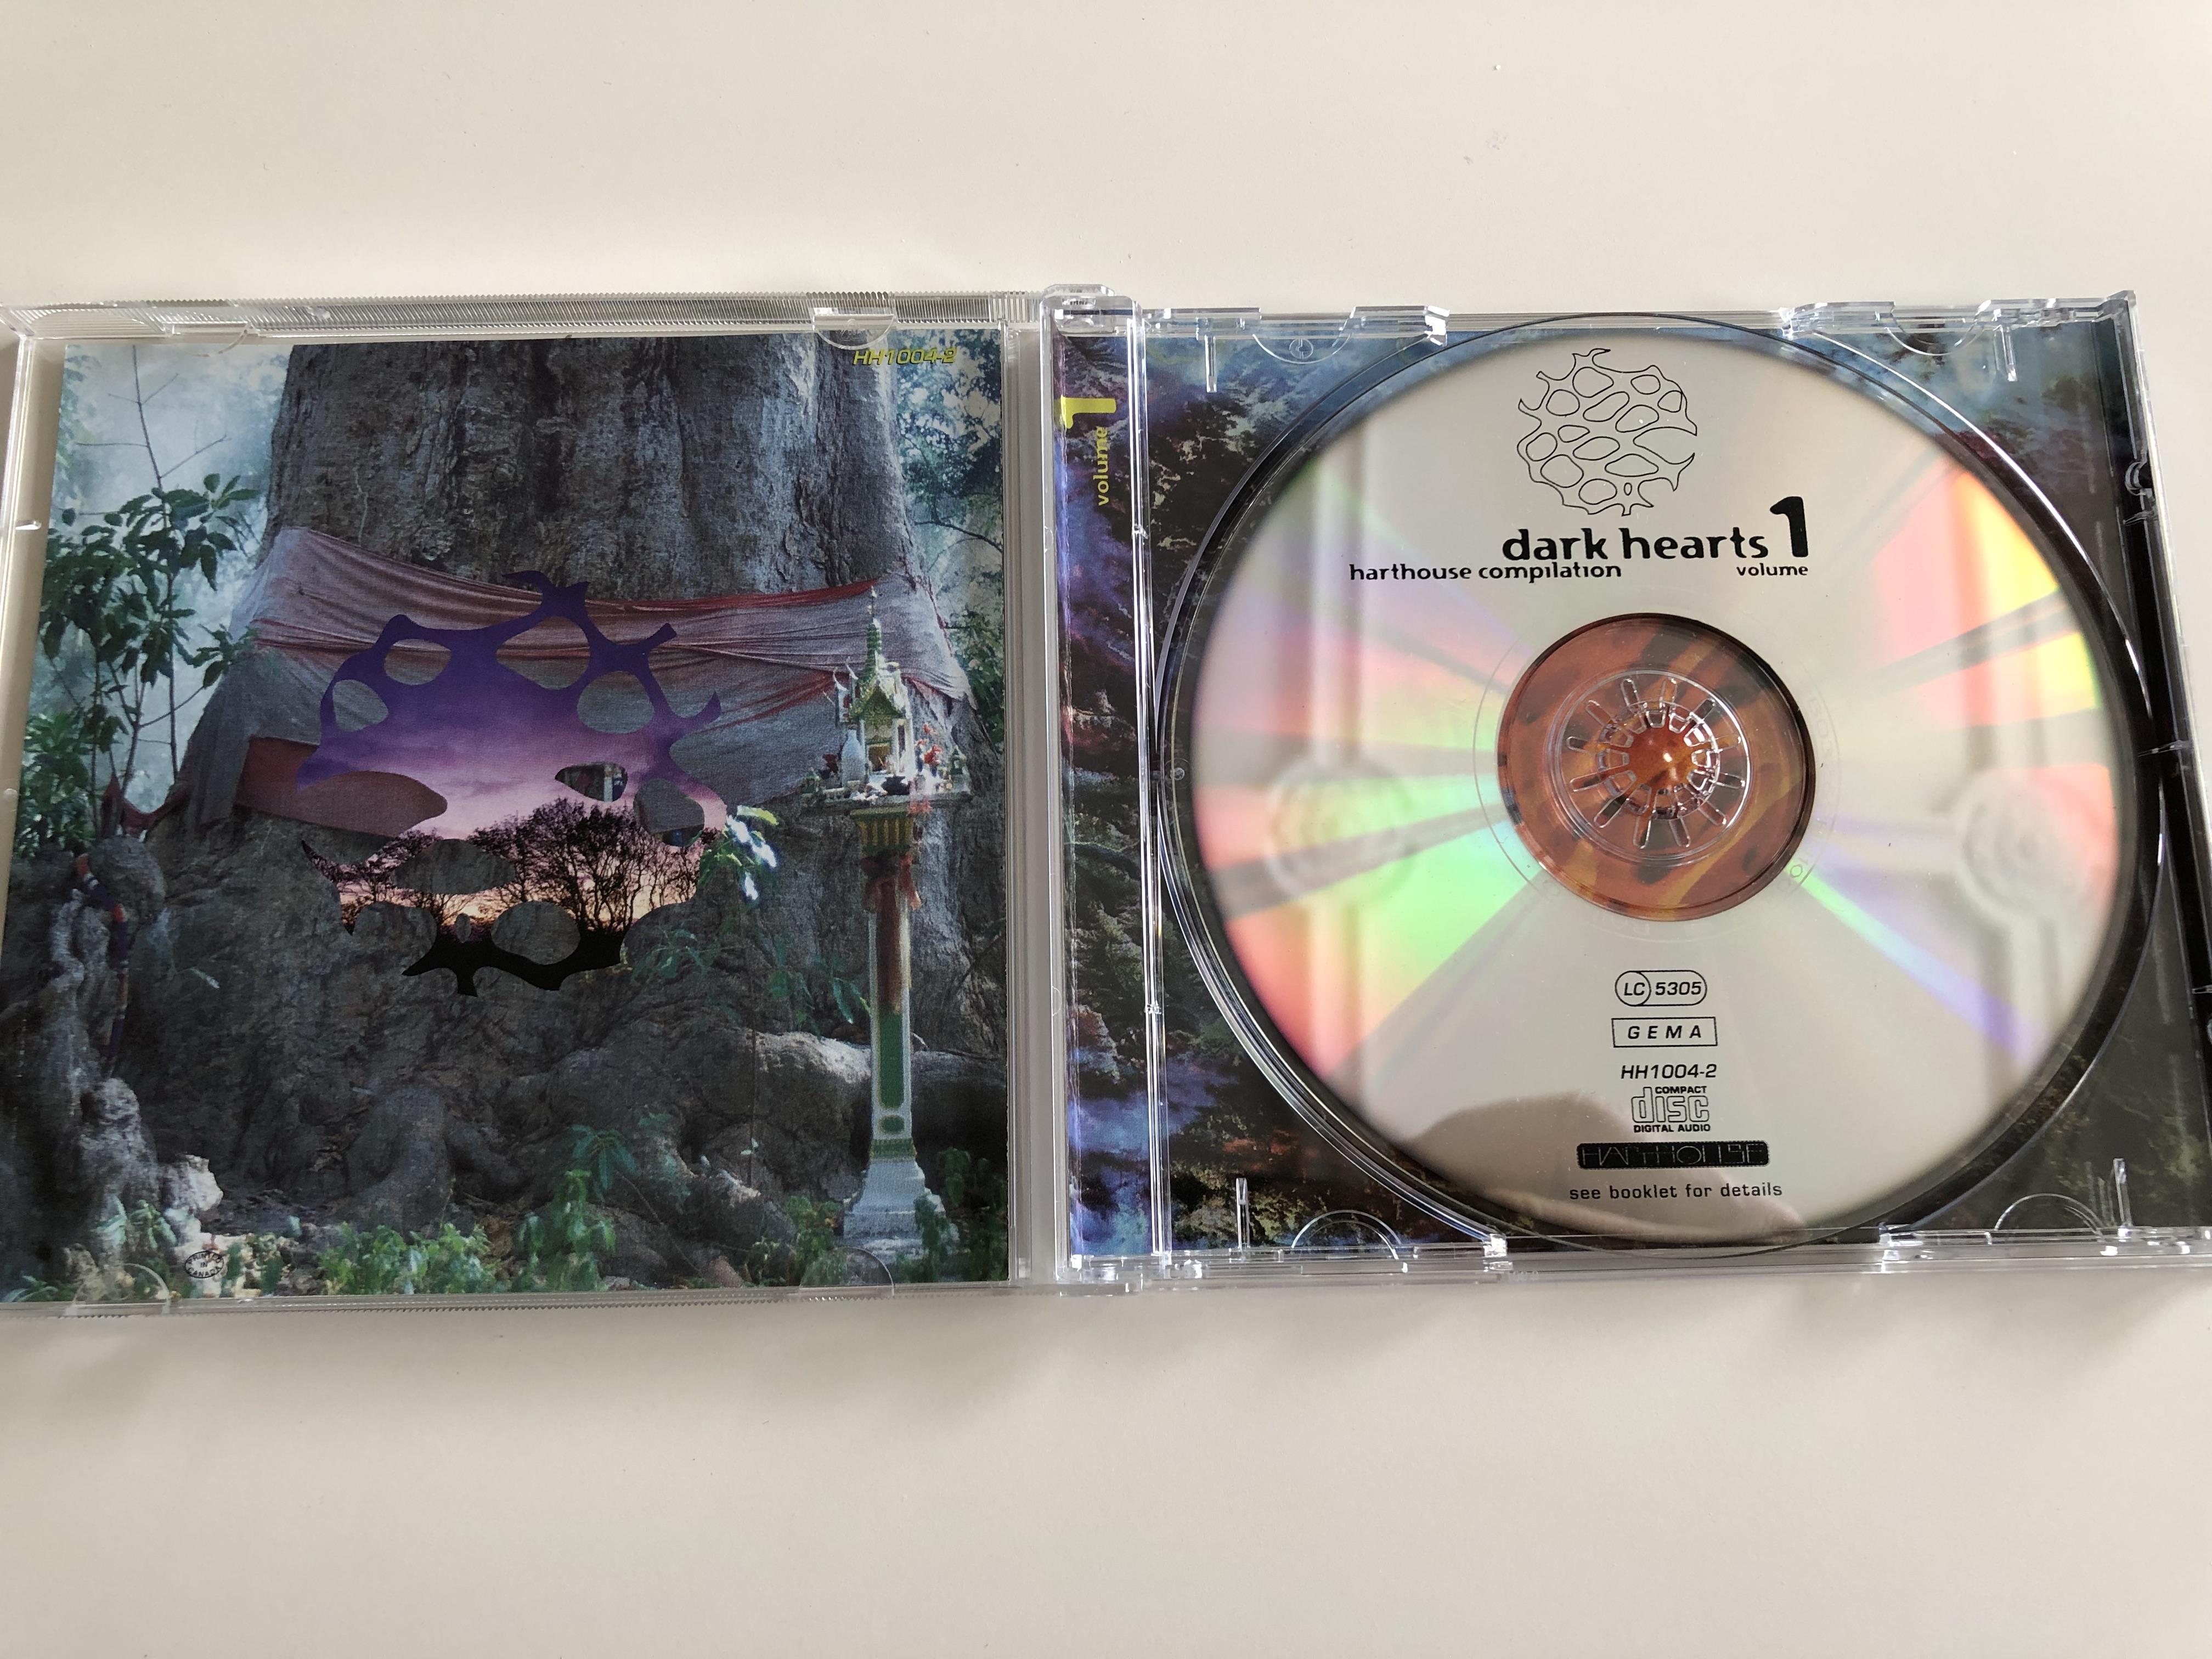 dark-hearts-vol.-1-harthouse-compilation-metal-master-the-ambush-barbarella-progressive-attack-spicelab-alter-ego-audio-cd-1995-hh-1004-2-4-.jpg